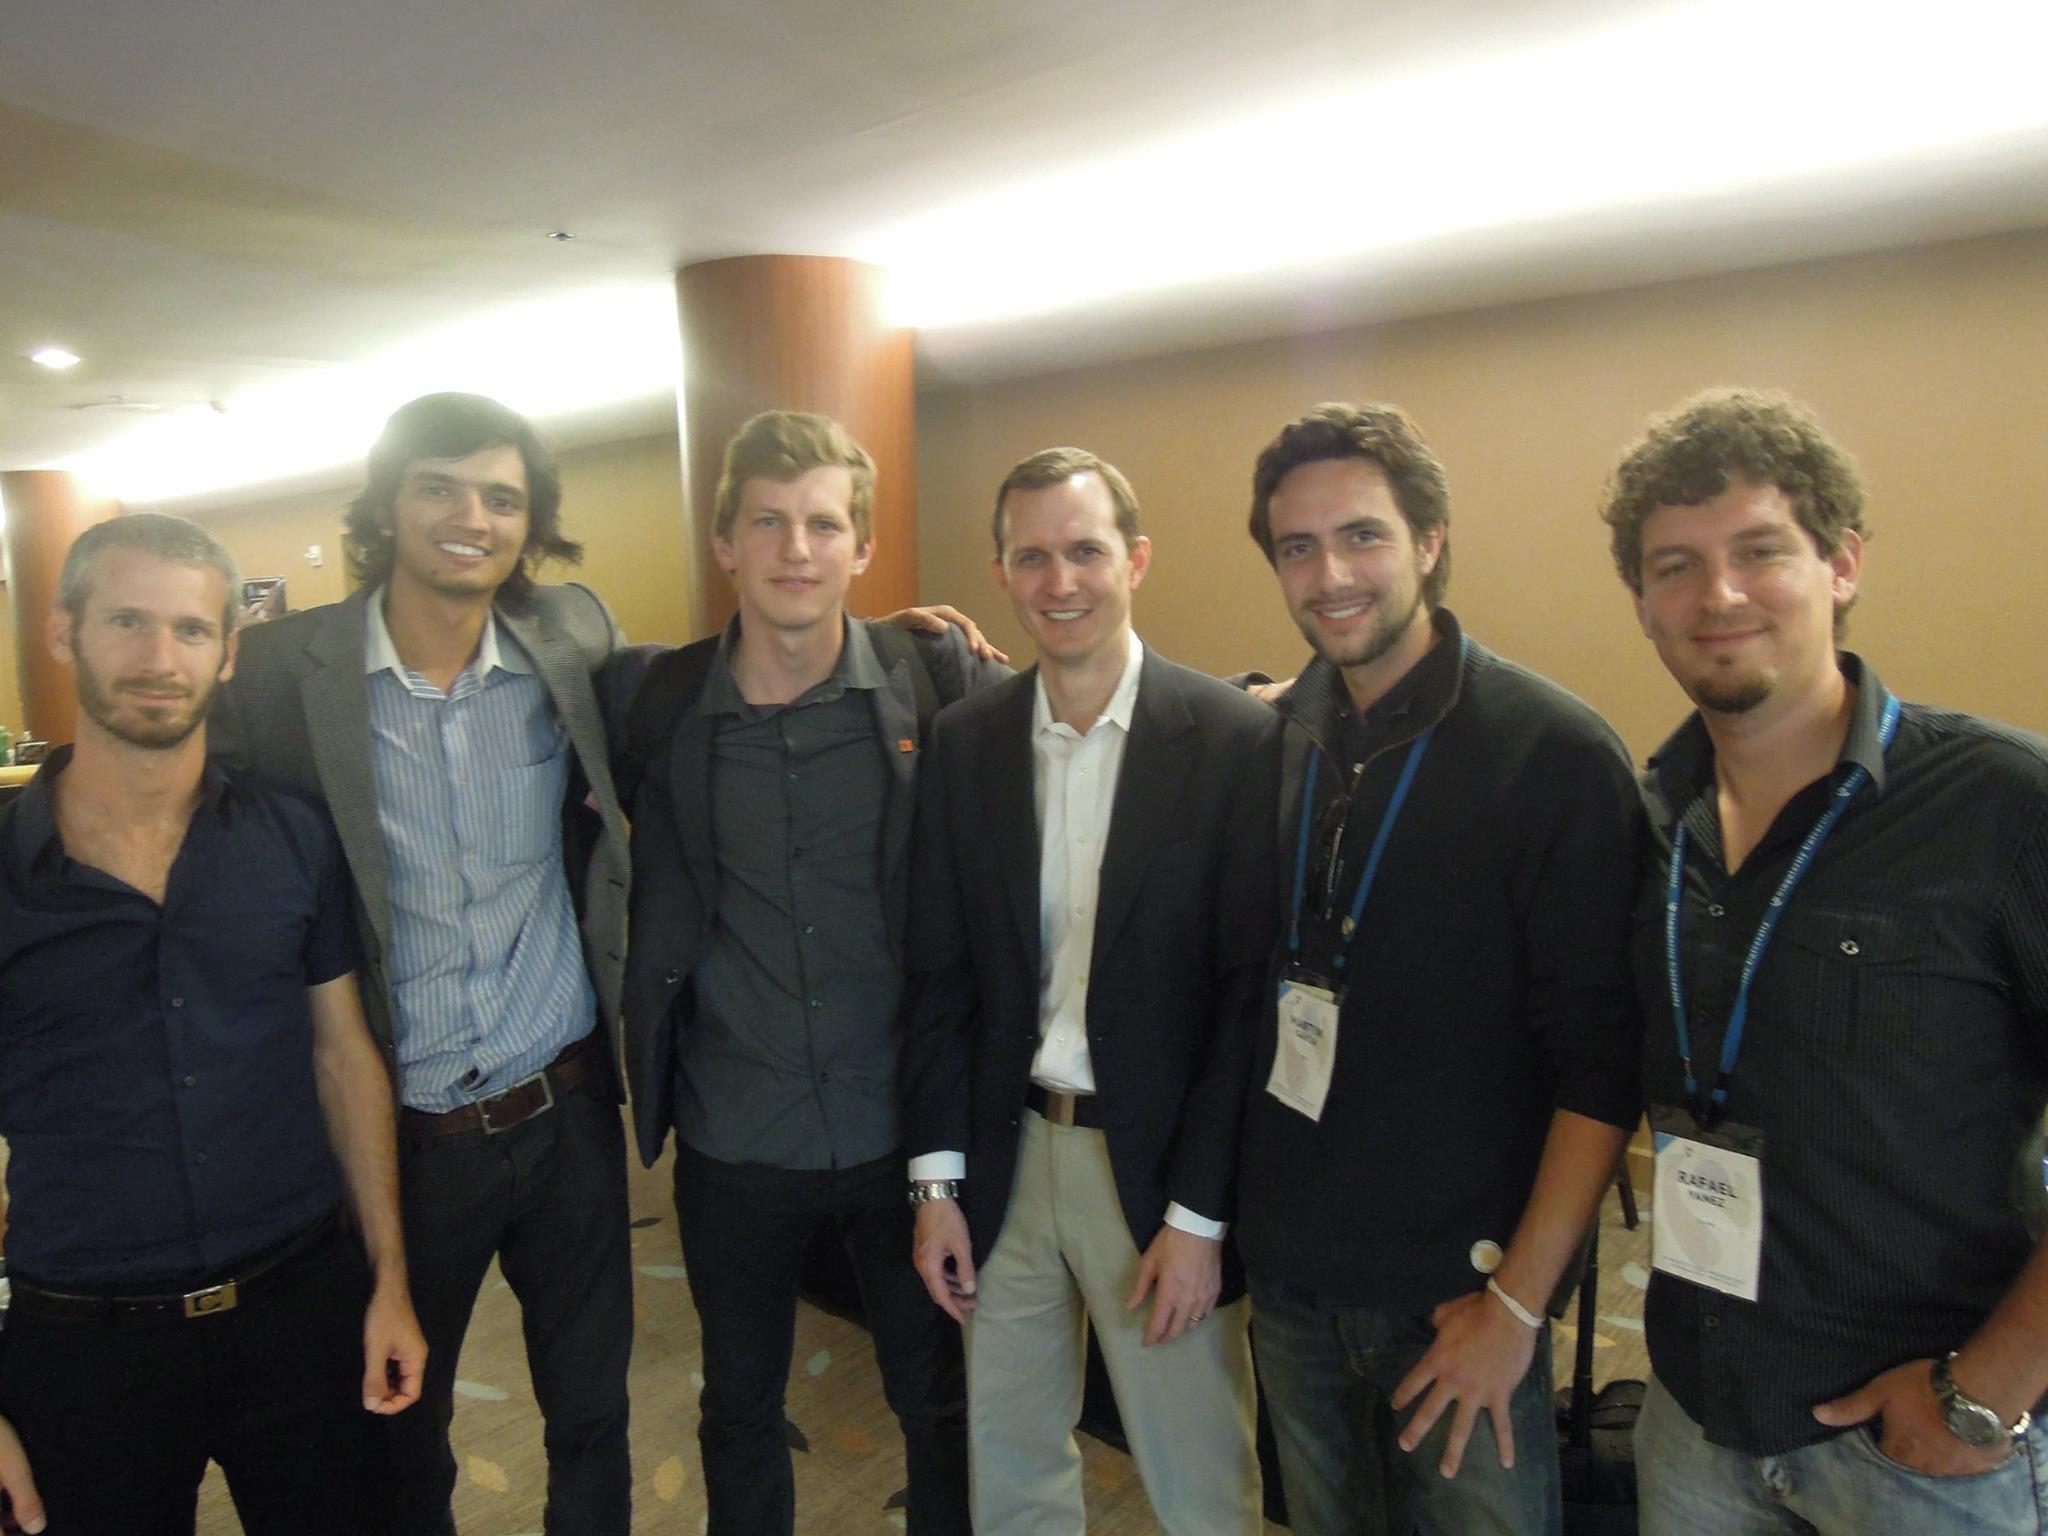 Menshenin and his Singularity University team with George Whitesides, CEO of Virgin Galactic (third from right). Photo: Yaroslav Menshenin // Skoltech.